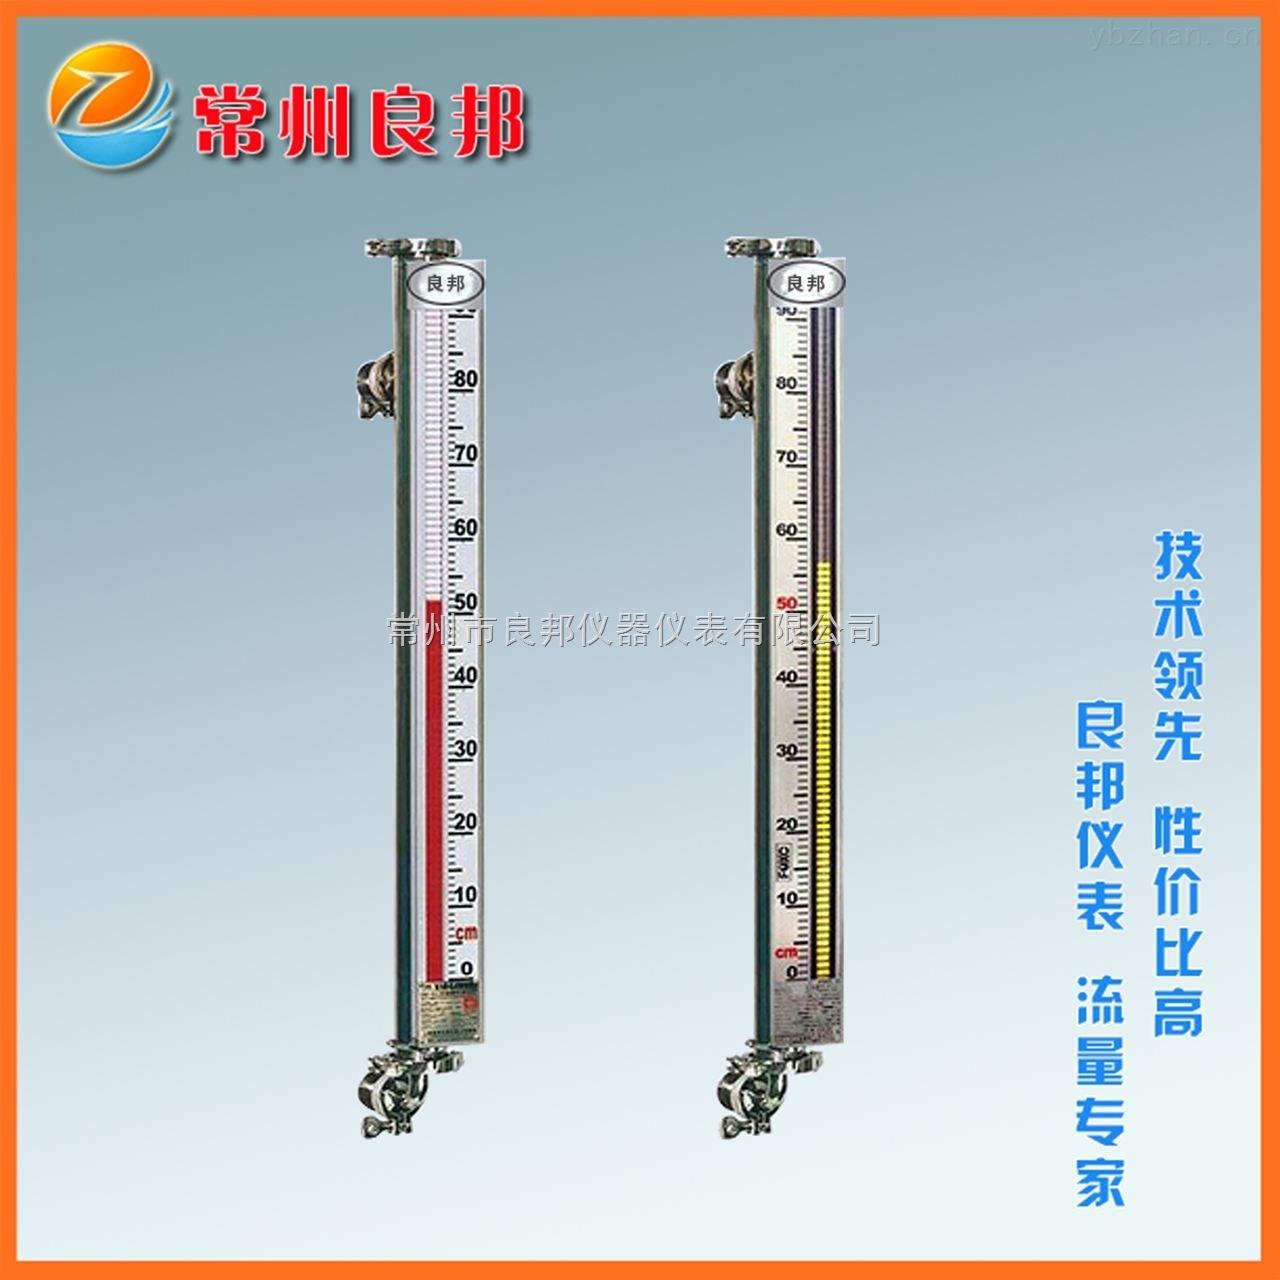 UHZ-防腐型磁翻板液位计铝合金翻板/塑料材质PP储罐测量液位